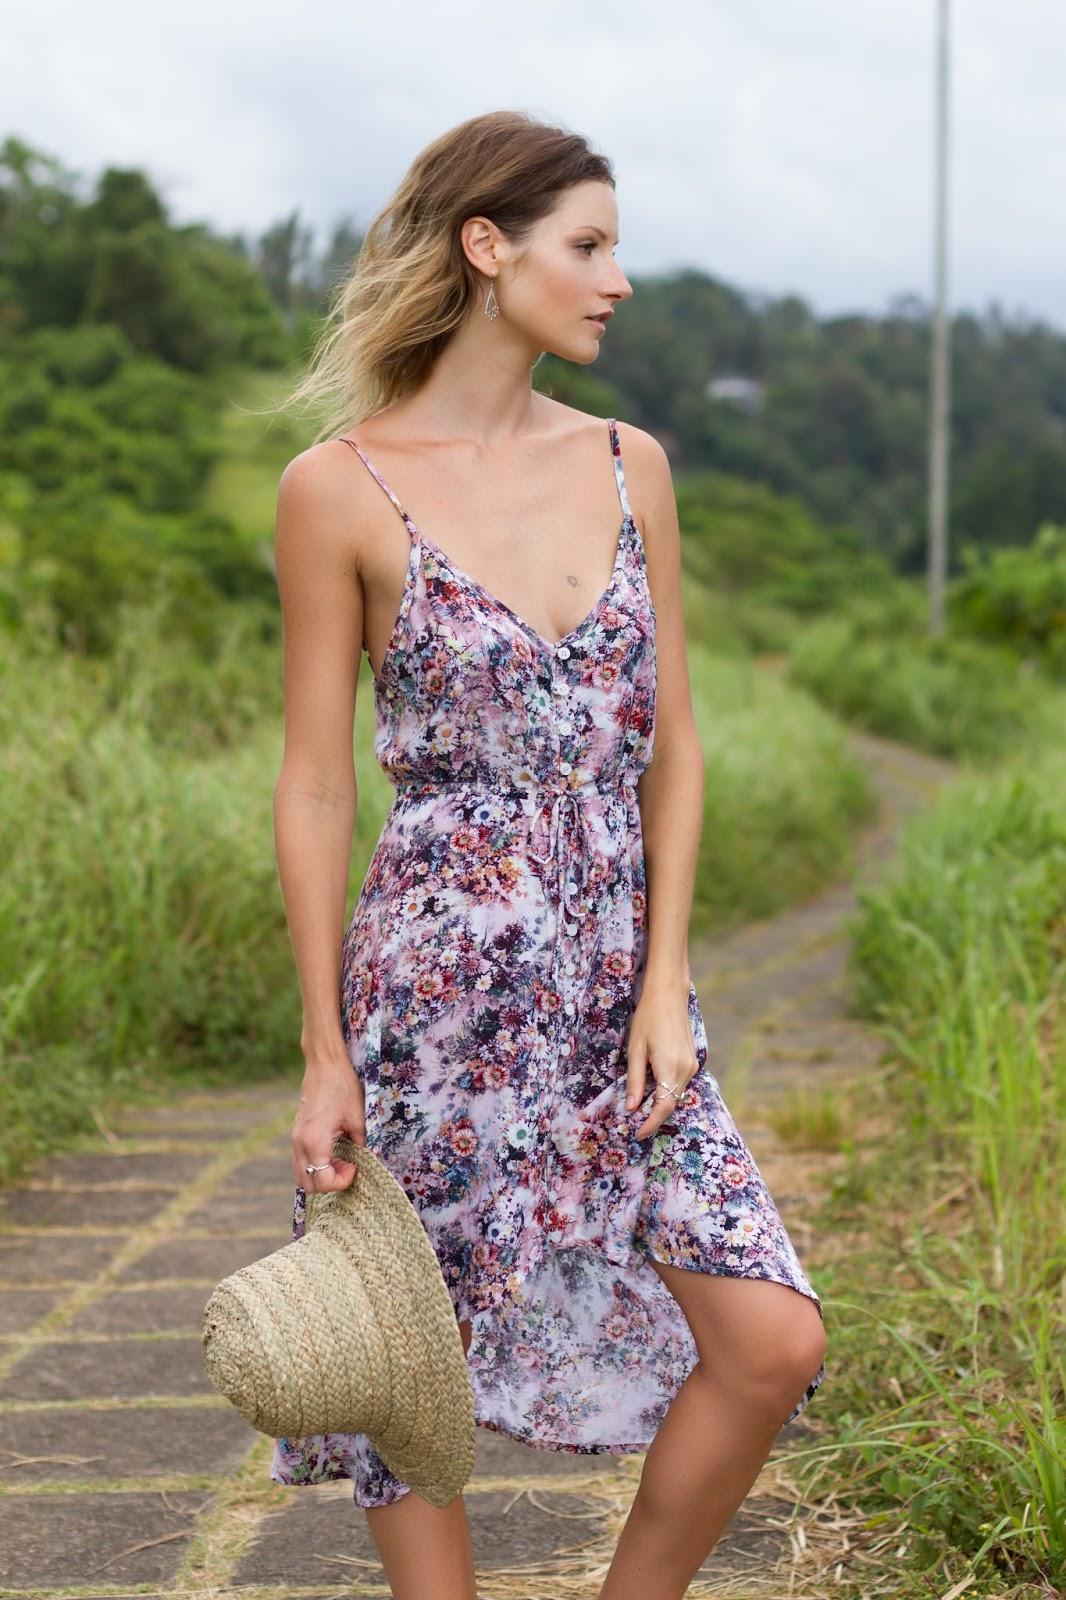 Fashion and travel blogger, Alison Hutchinson, is wearing a floral print bohemian KAYVALYA dress at the Ridge Walk in Ubud, Bali